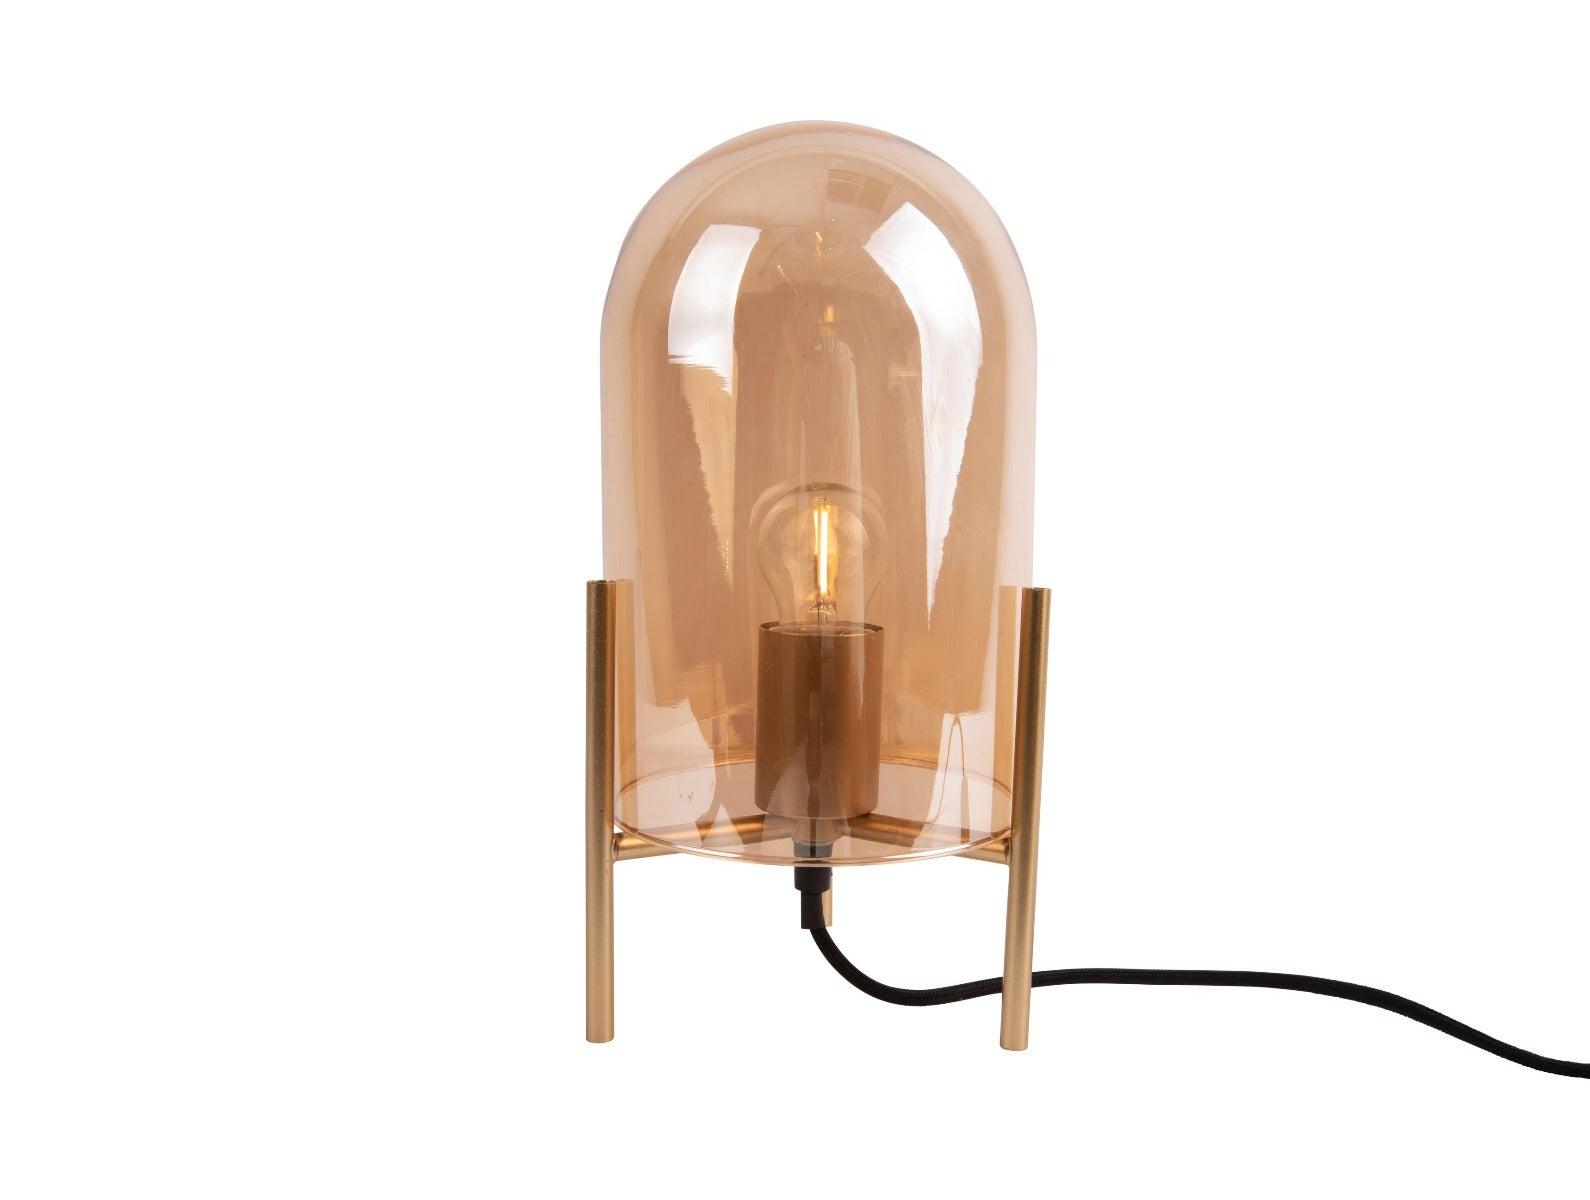 Tafellamp glass bell Amber bruin in de Intratuin webshop